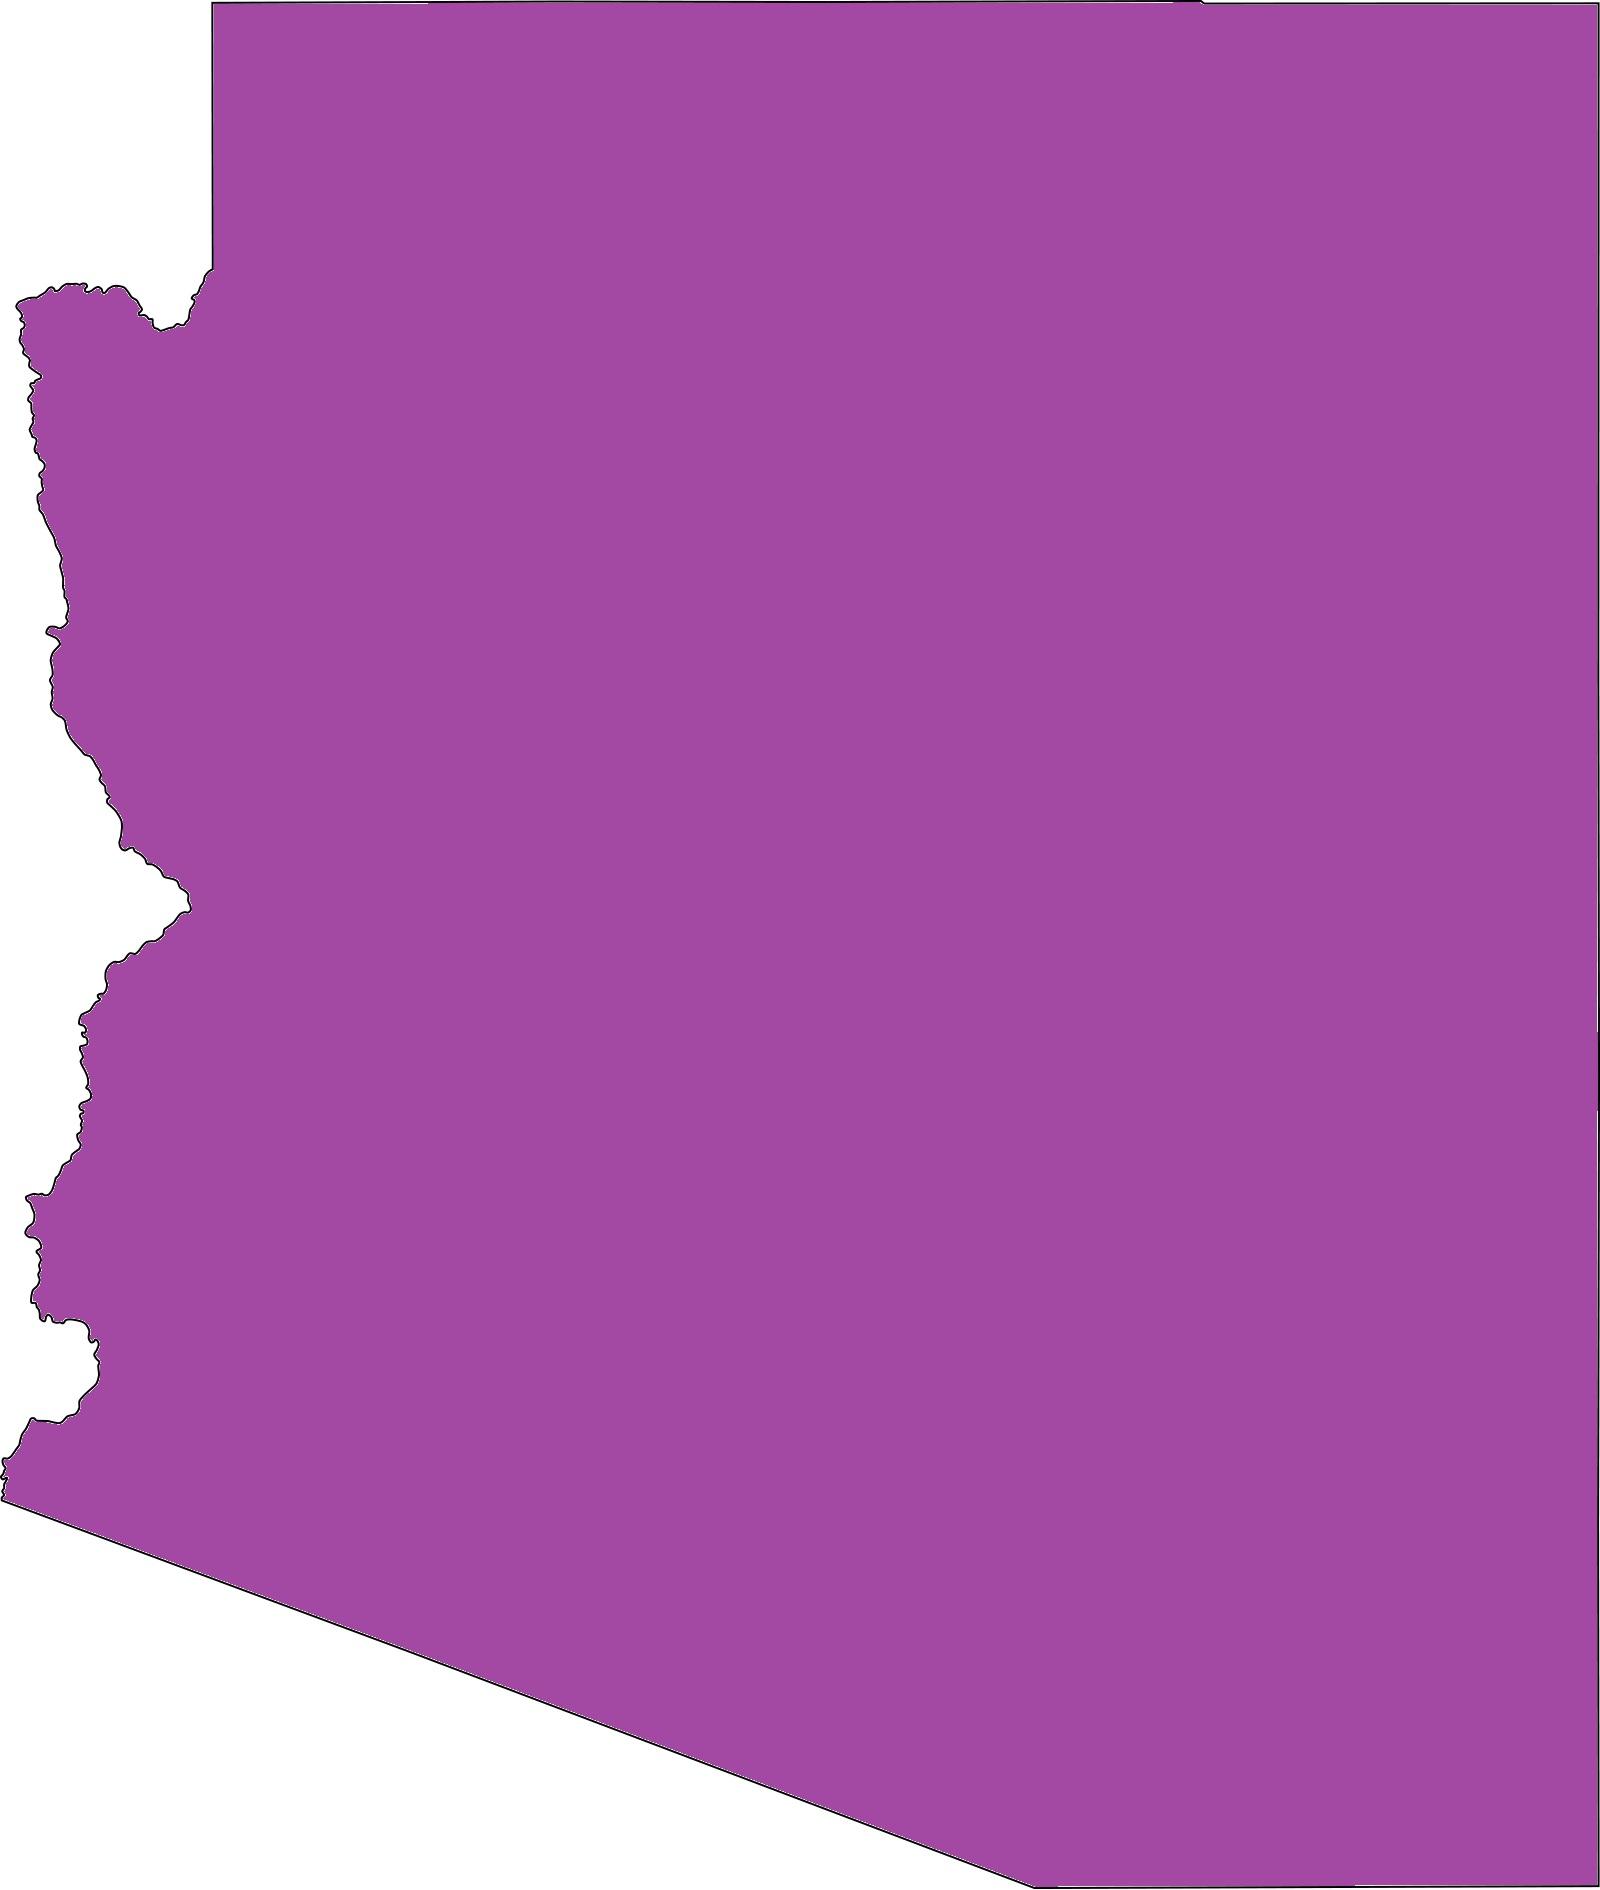 Arizona Blank Outline Map   Blank Outline Map of Arizona – 3